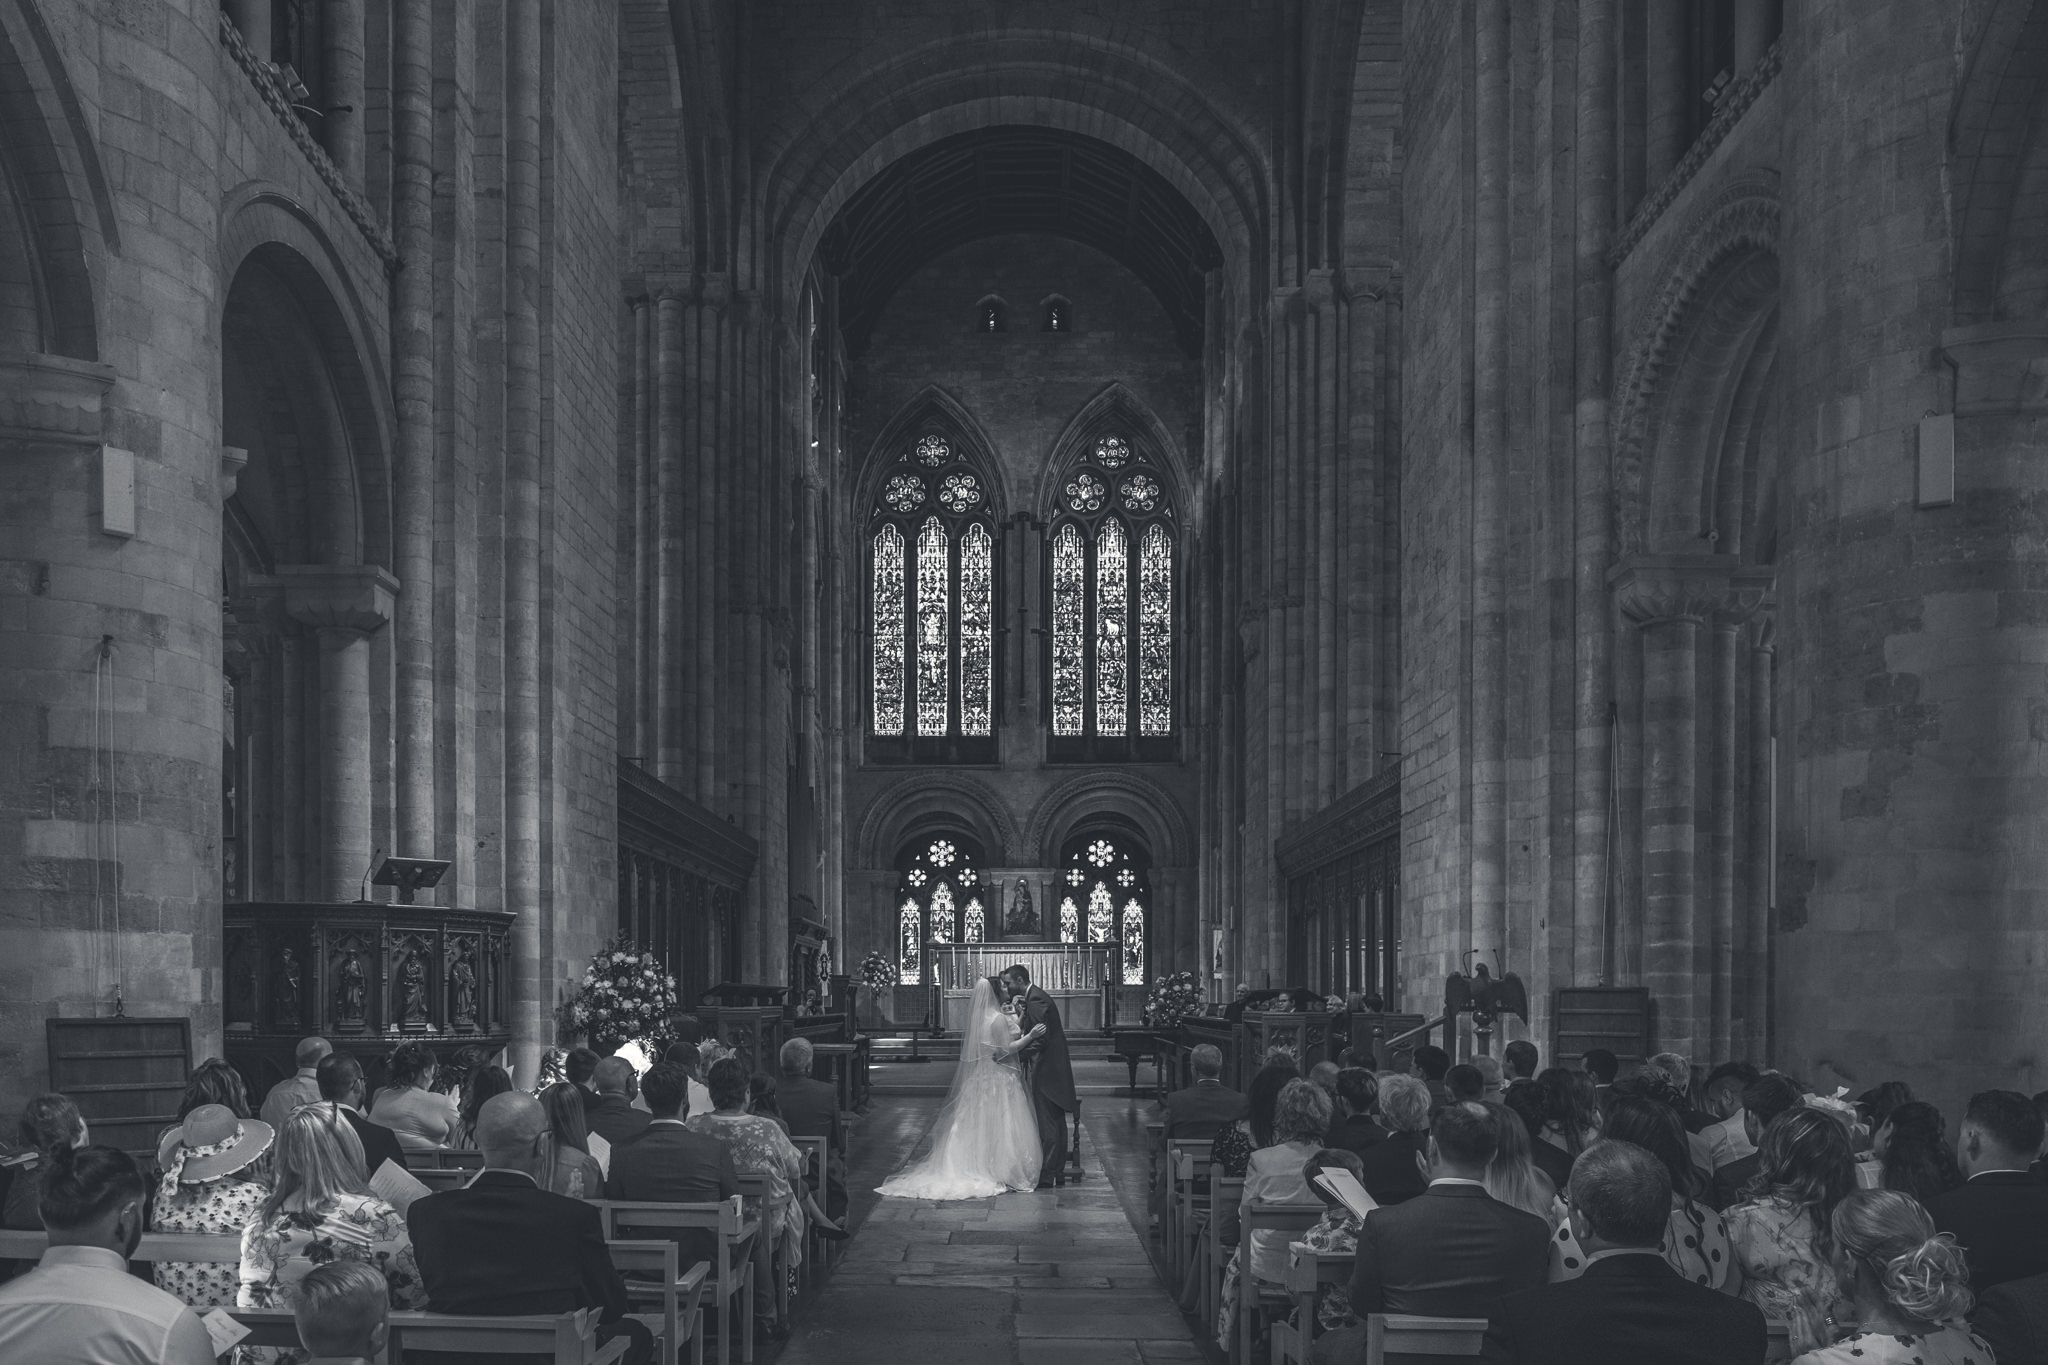 Romsey Abbey Wedding Photographer - L+C